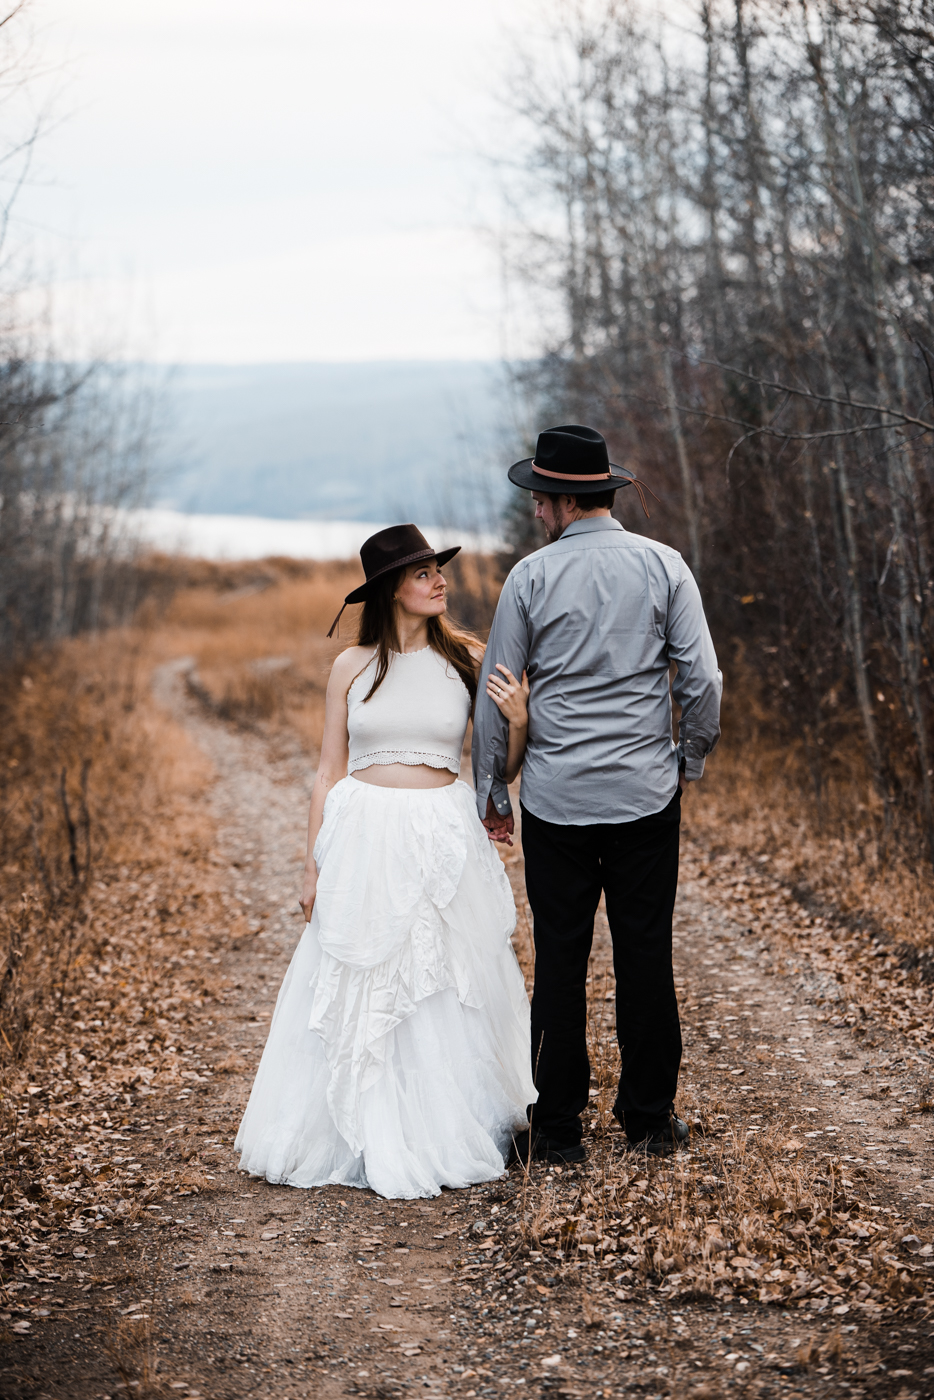 FortSt.John_photographer_TyraEPhotography_Wedding_Couple_Family_Photograhy_DawsonCreek_Elopement_Bride_Boduoir_Portraits-27.jpg